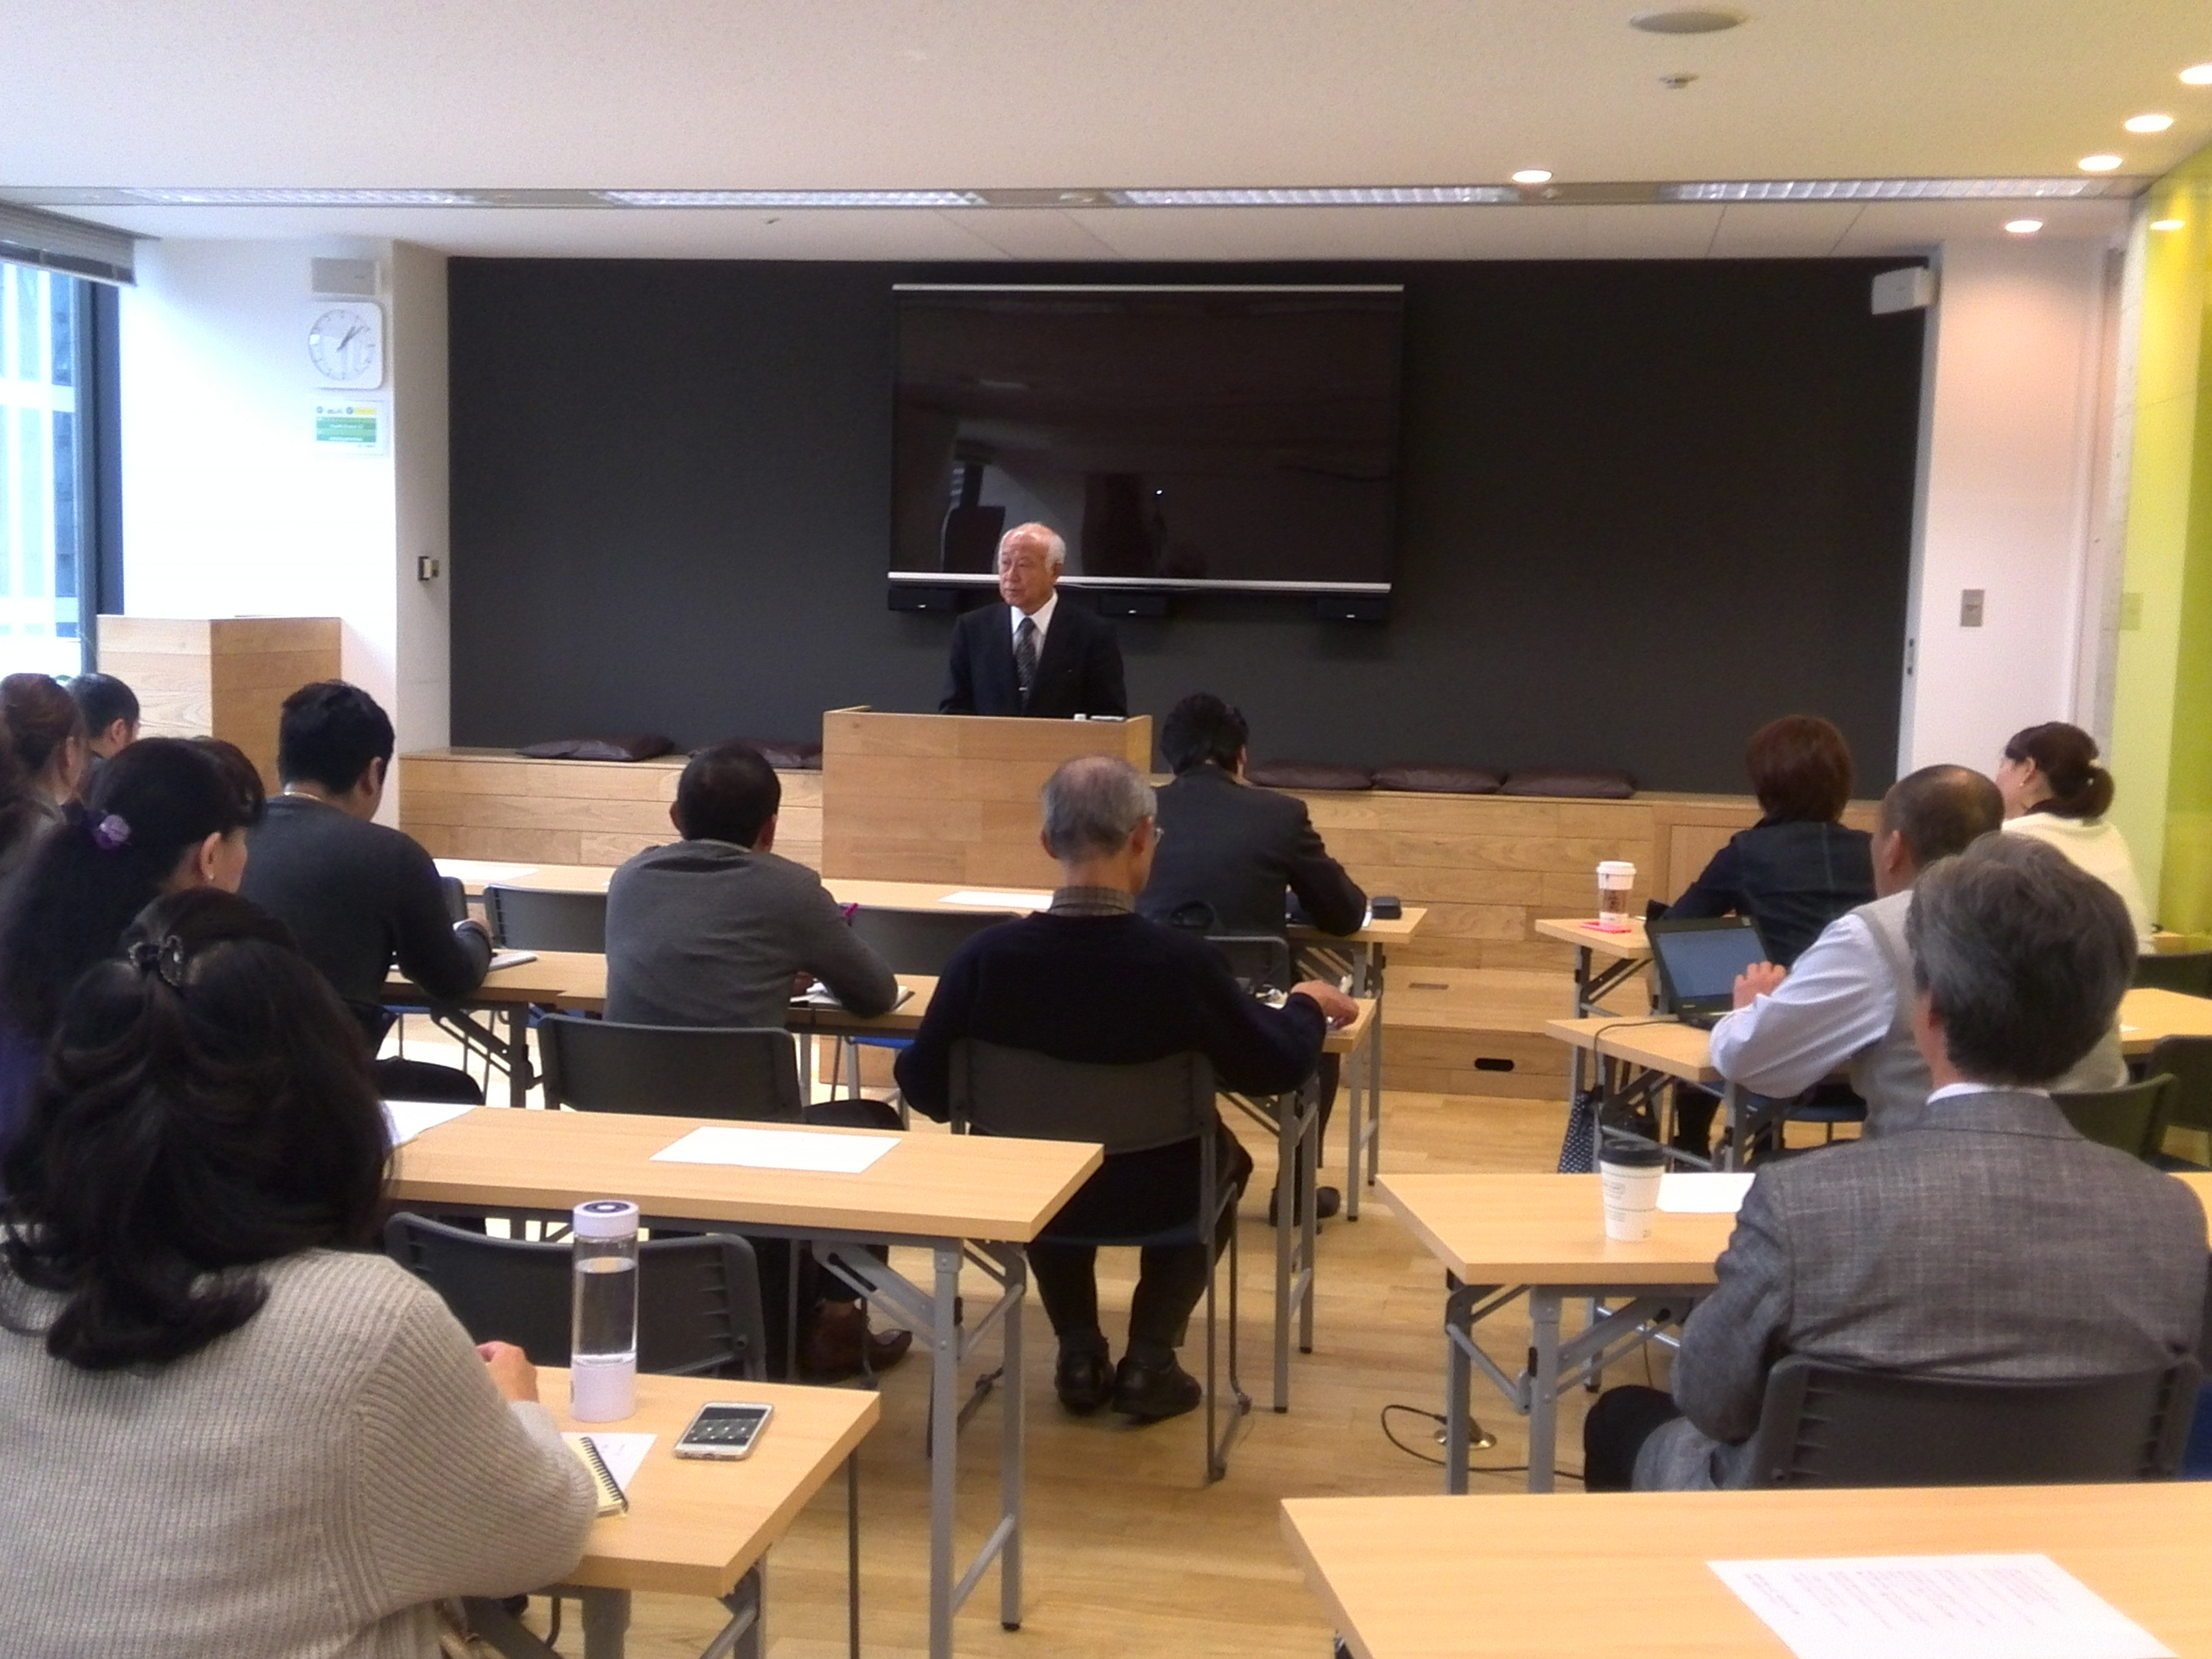 IMG 20160206 130725 - 4月1日東京思風塾の開催になります。